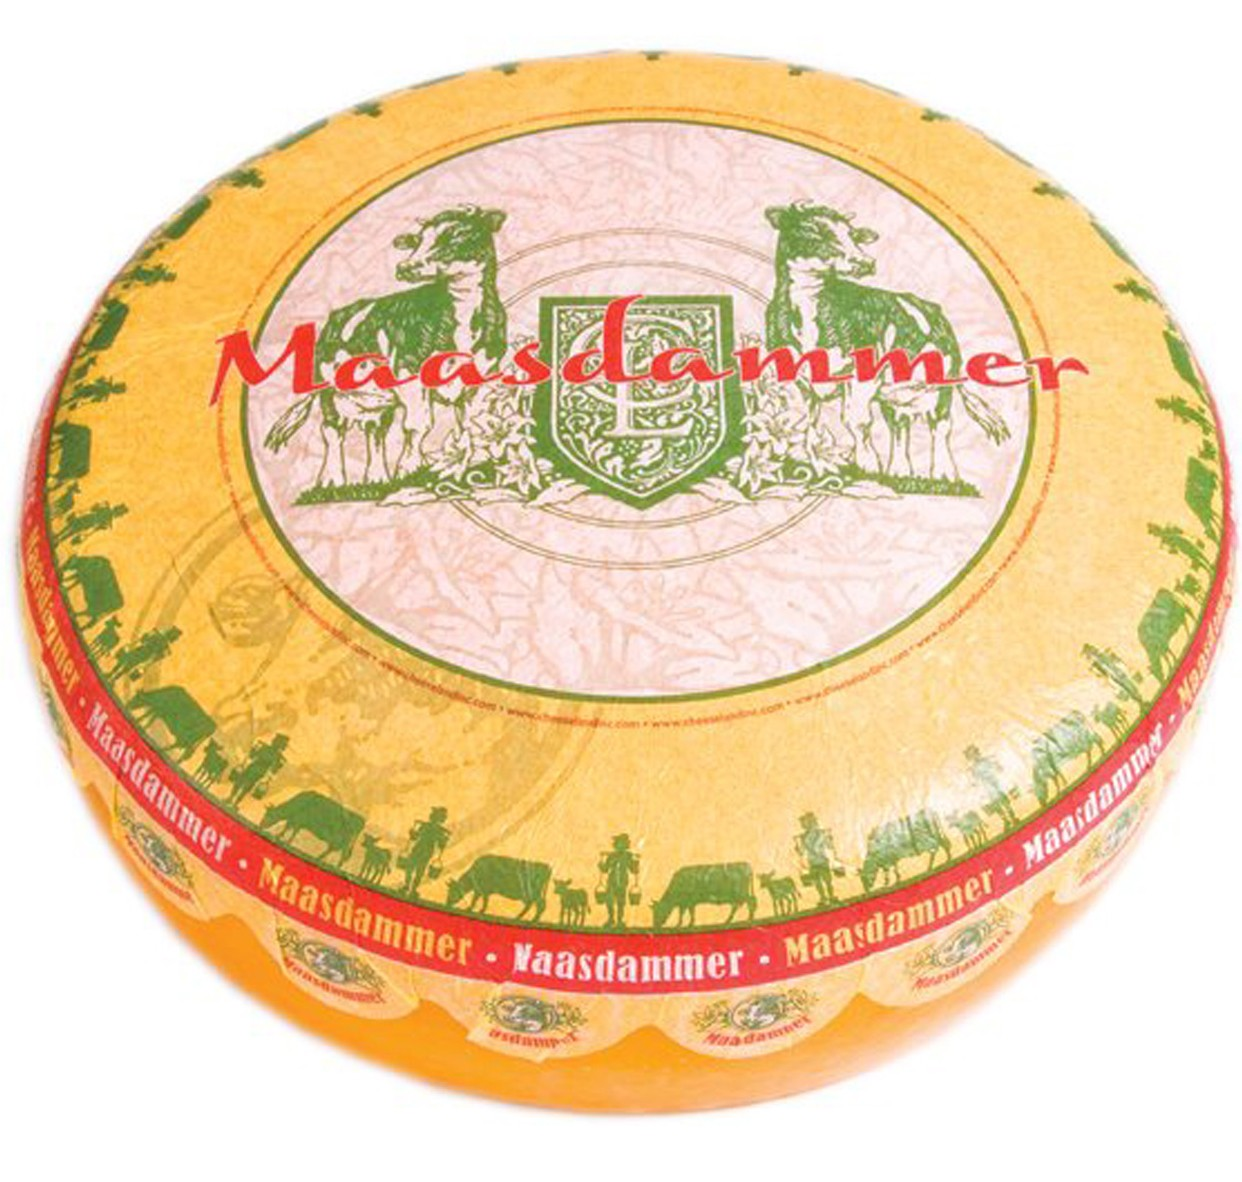 Сыр Maasdammer Cheeseland фото